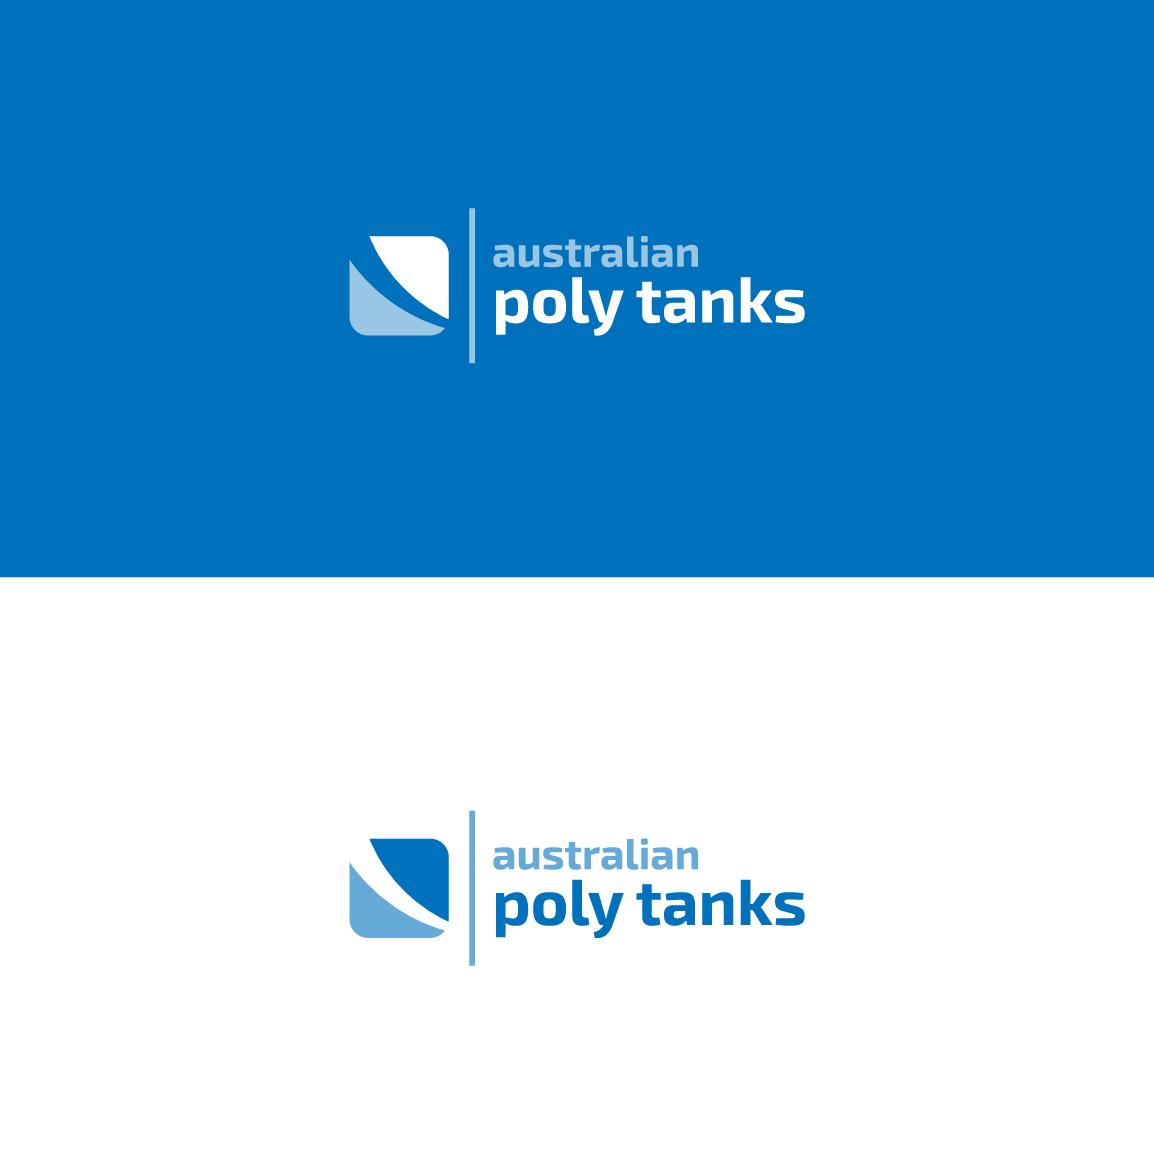 It Company Logo Design for Australian Poly Tanks by Fanolj Ademi ...